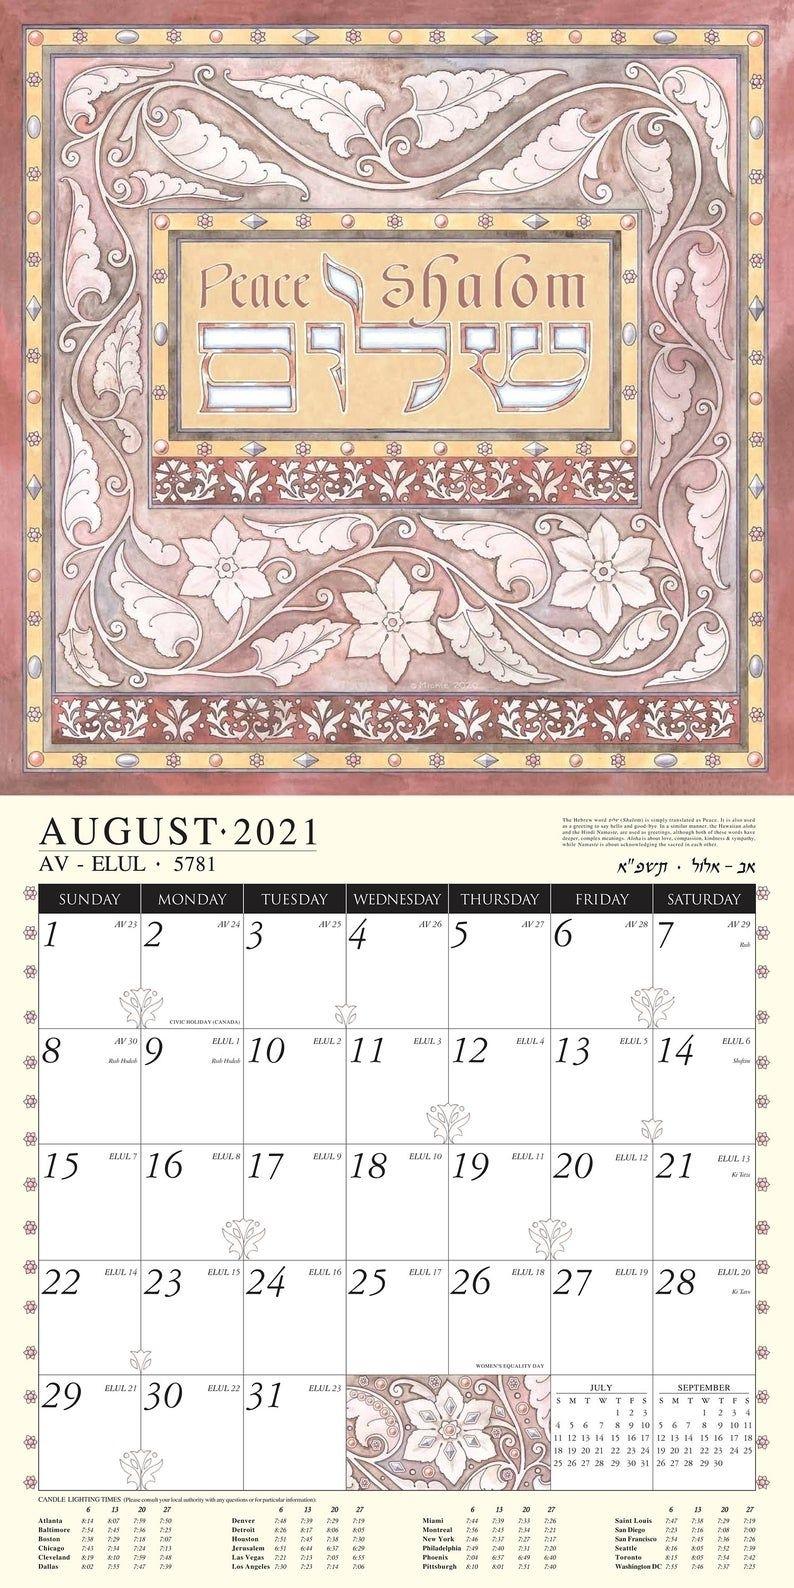 Jewish Art Calendar 2021 Mickie Caspi 16 Month Wall | Etsy